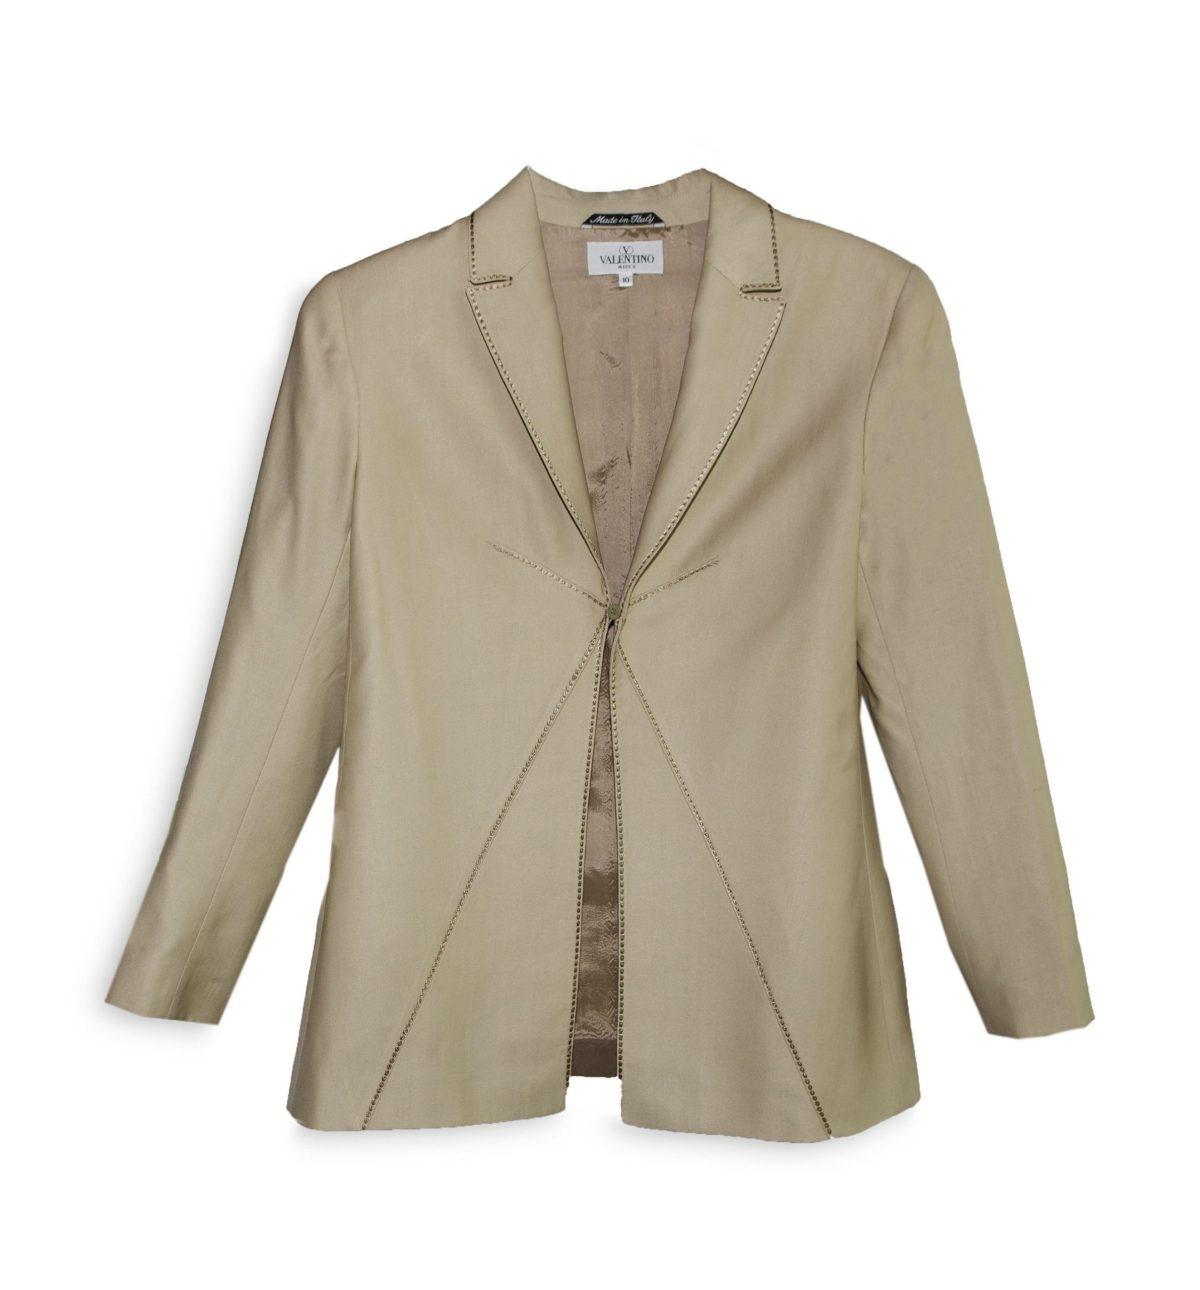 Vintage Miss V Valentino Tan Blazer, Size 10, SIlk-Wool Blend